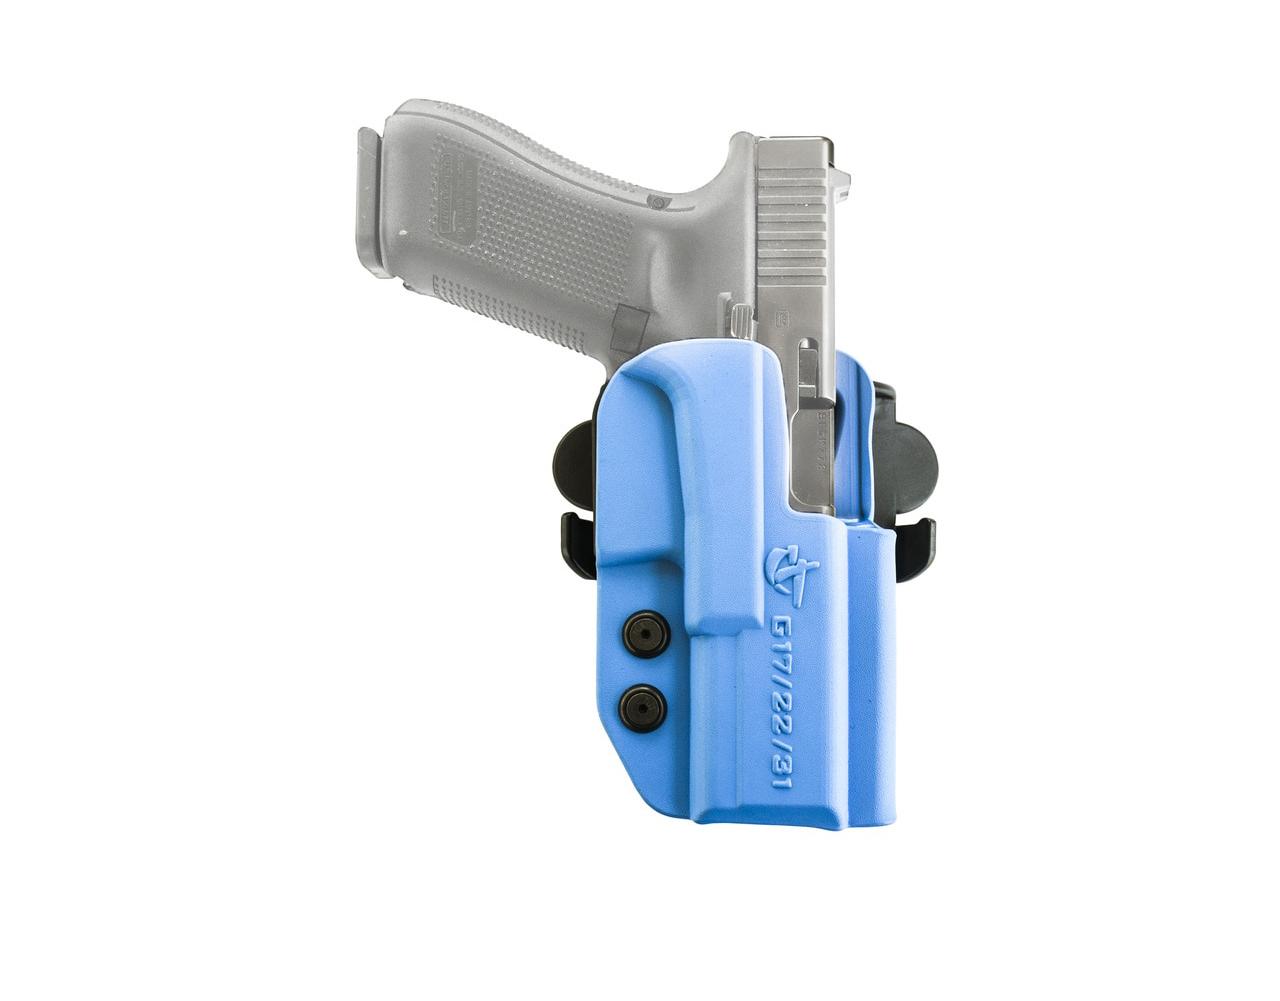 COMP-TAC International Right Hand Blue OWB Holster For Glock 17/22/31 Gen 1-4 (C241GL043RBUN)